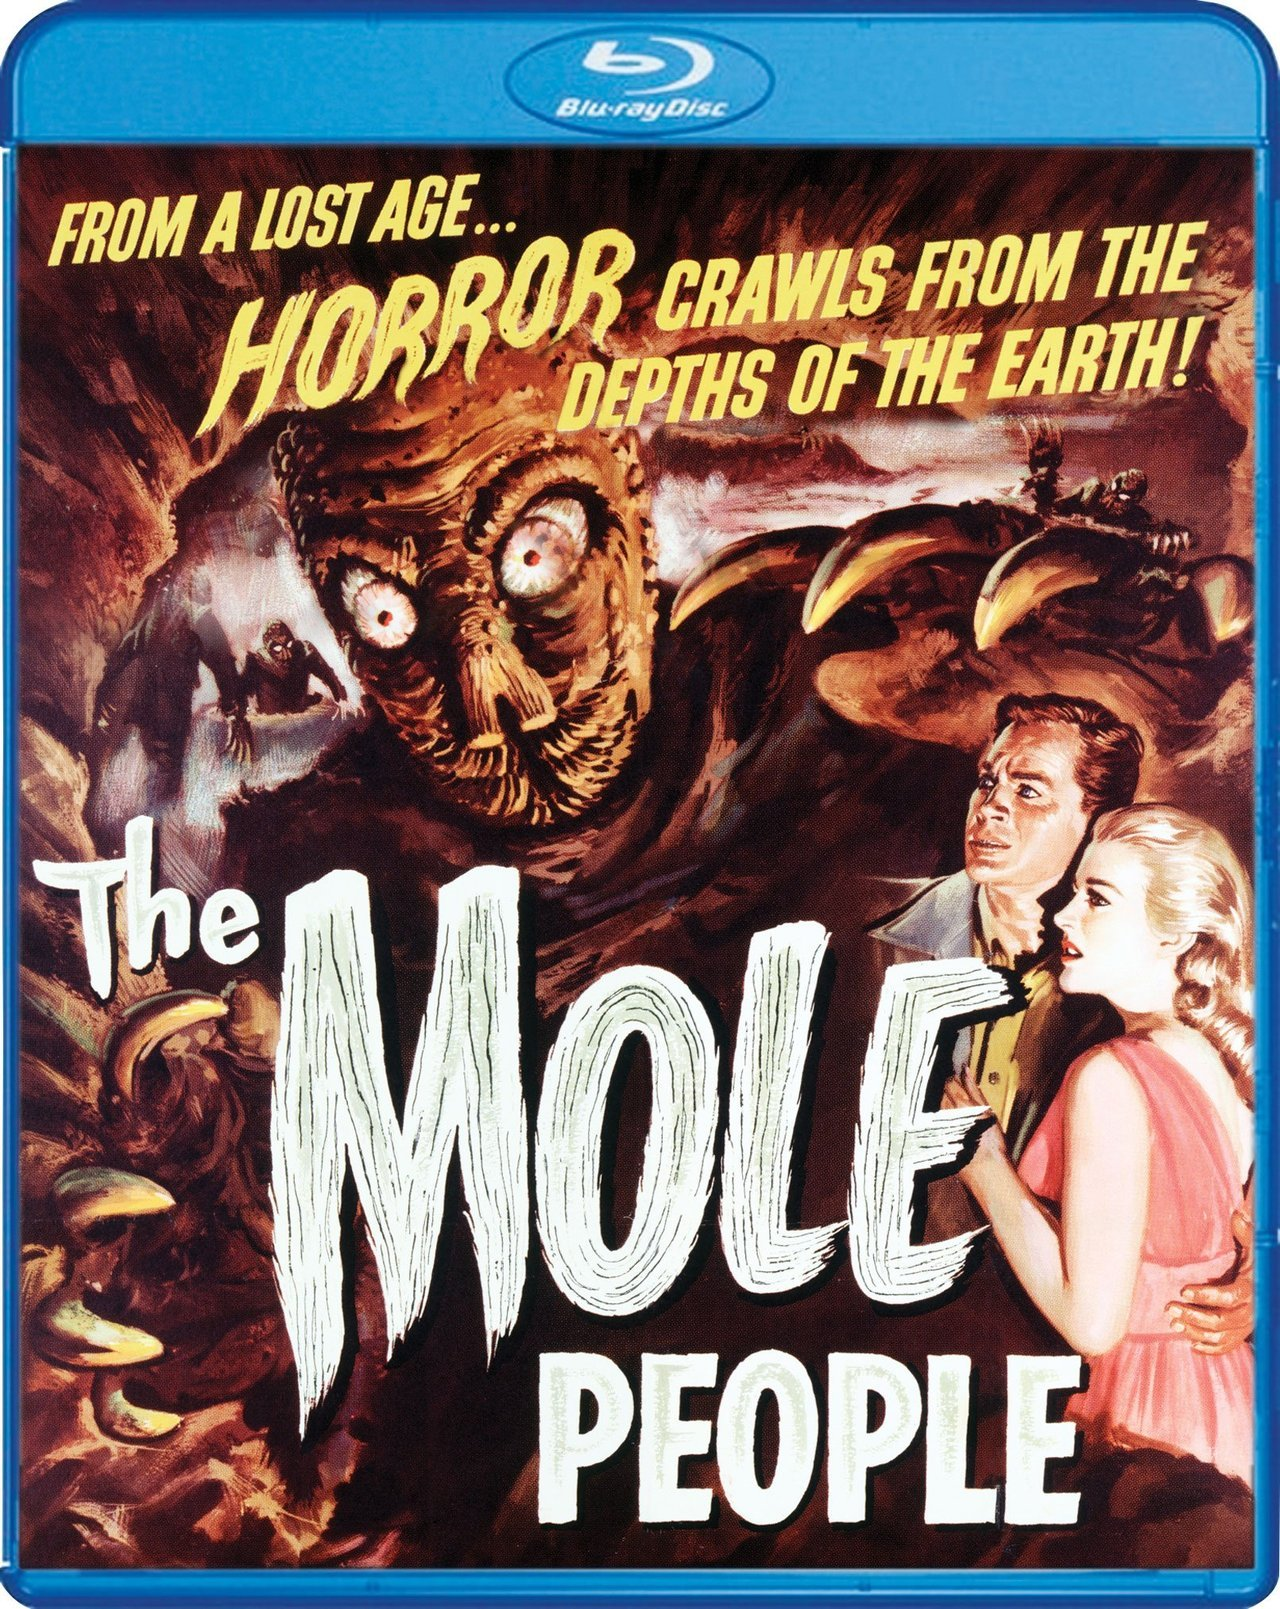 the mole people blu-ray